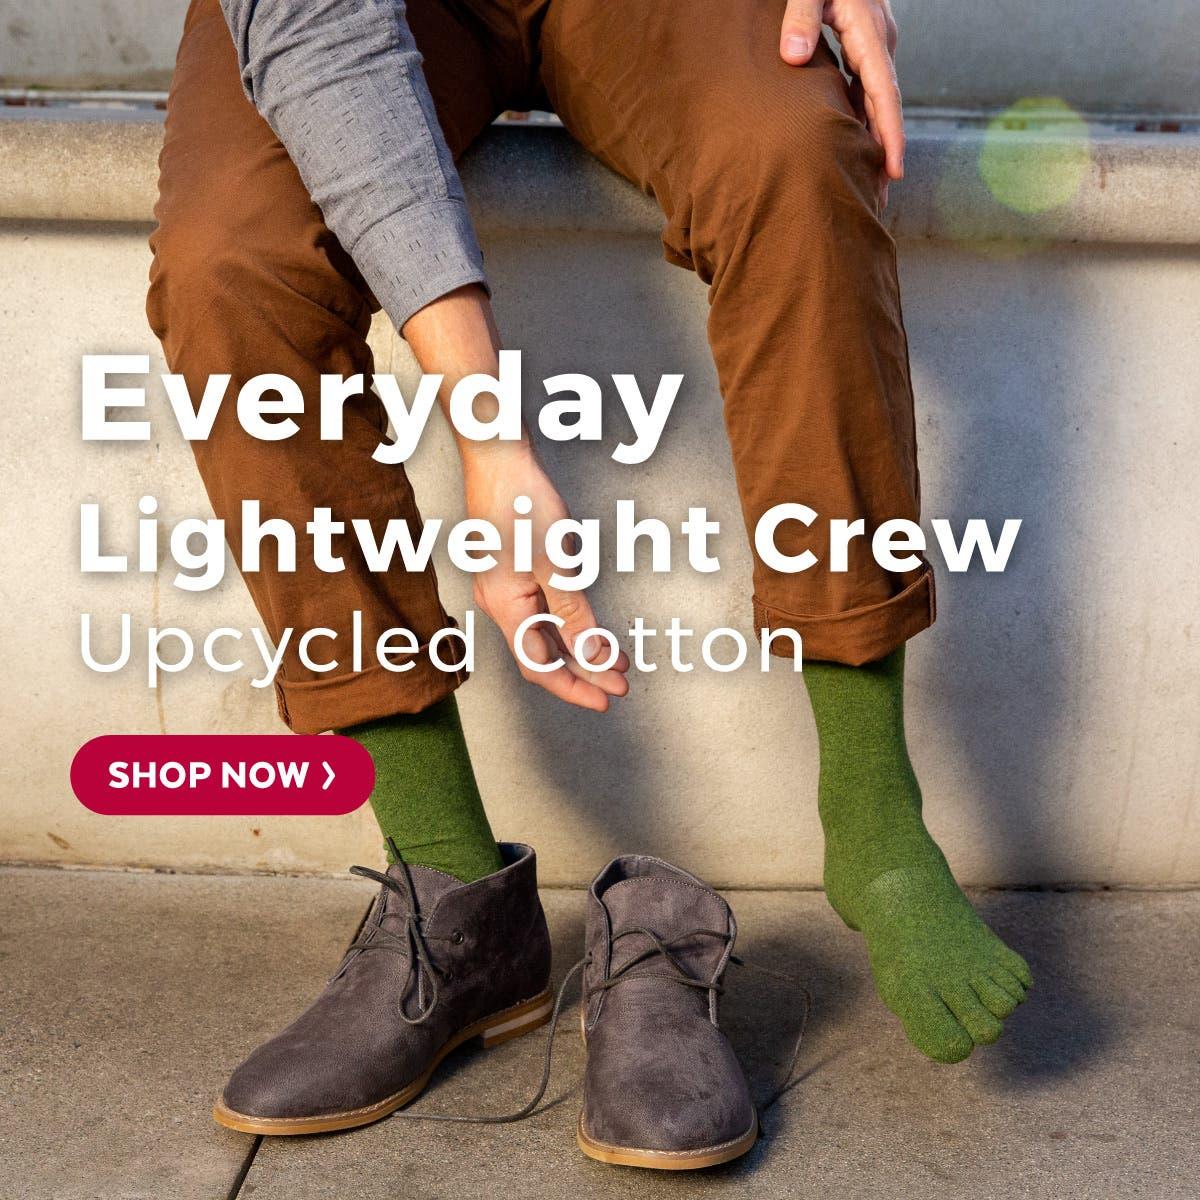 Everyday Lightweight Crew Upcycled Cotton